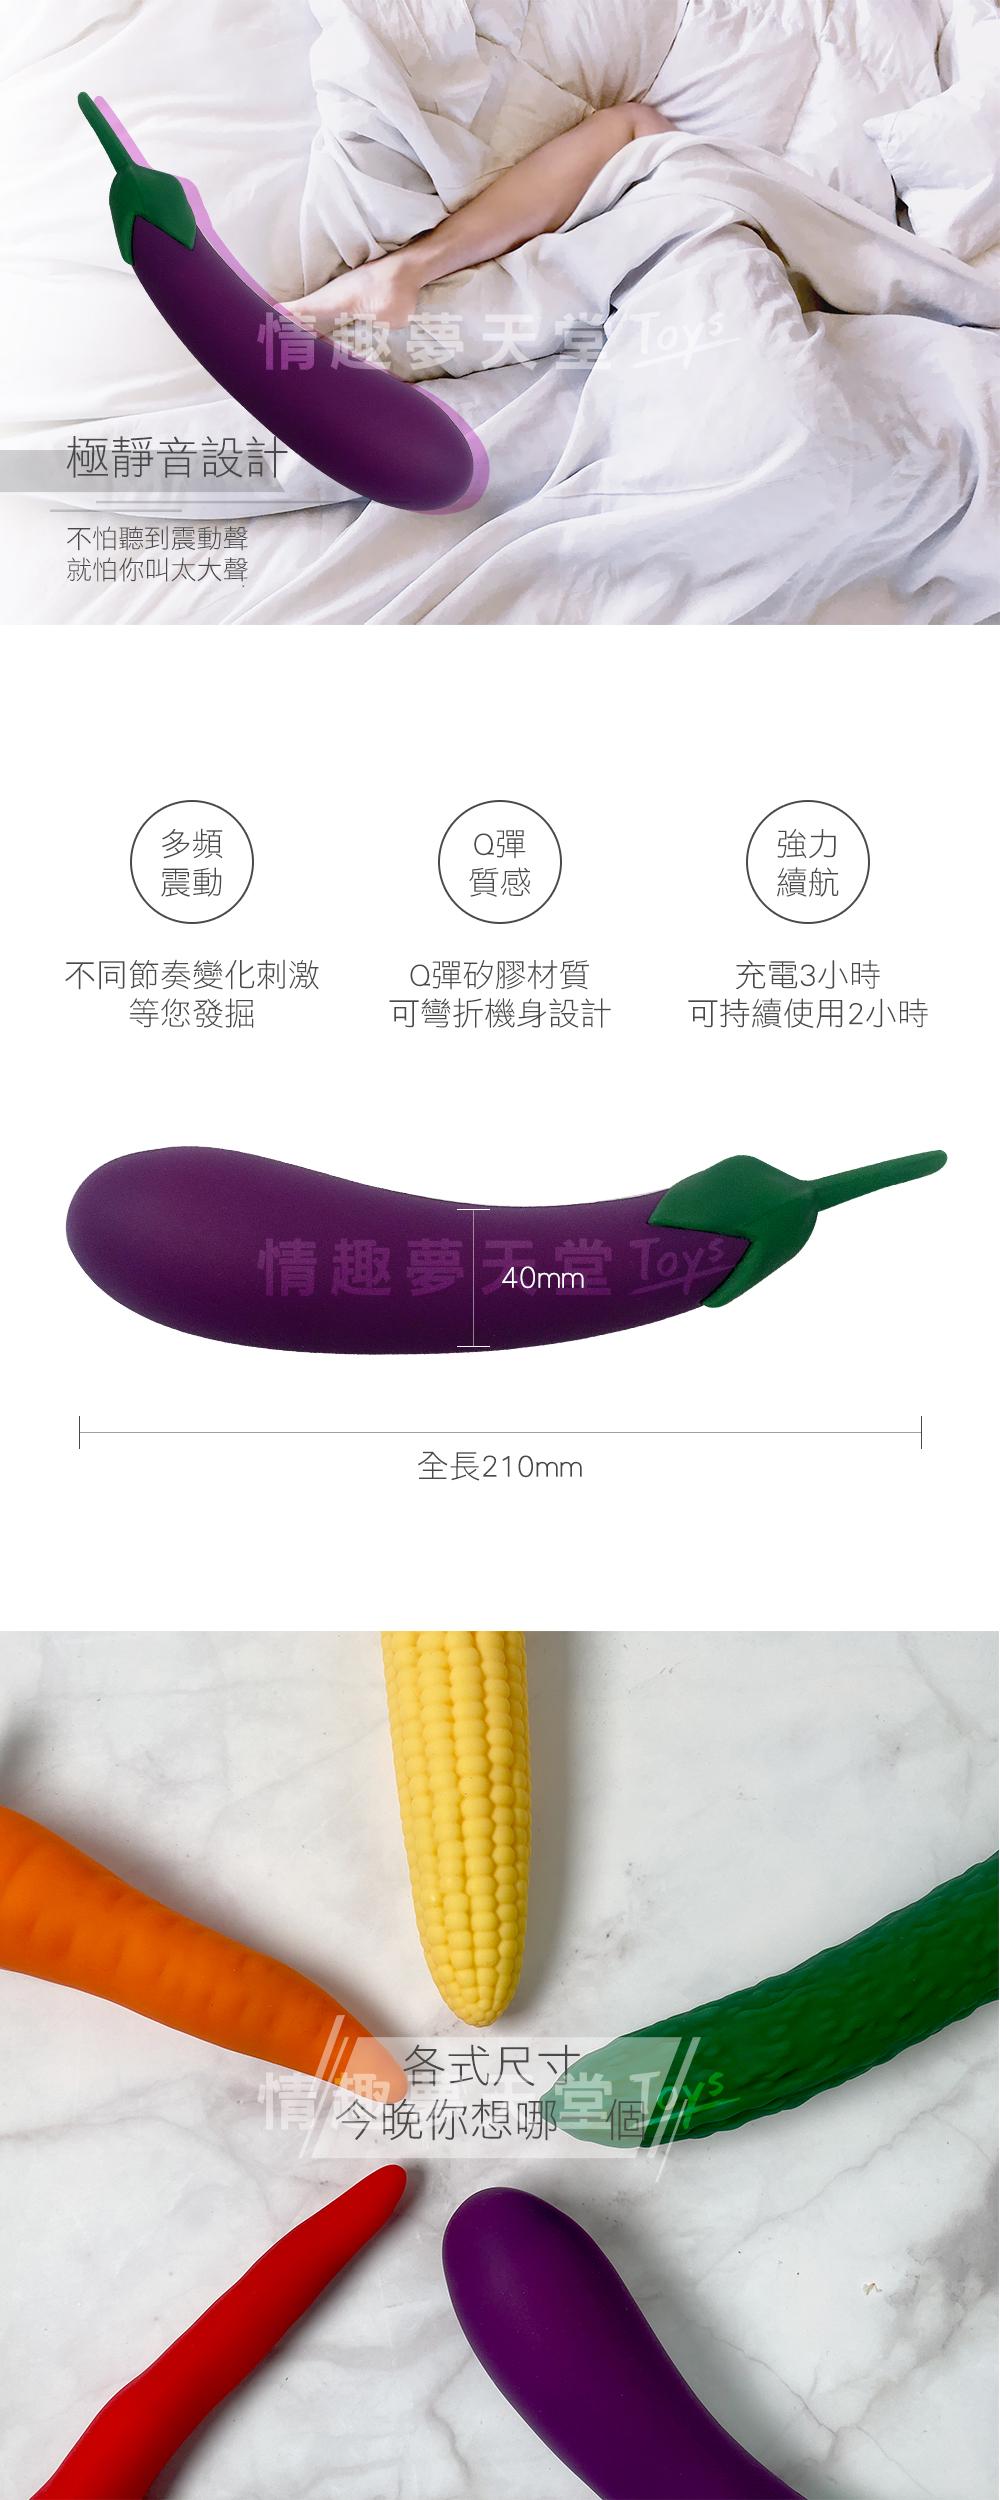 wistone 按摩棒 蔬菜系列